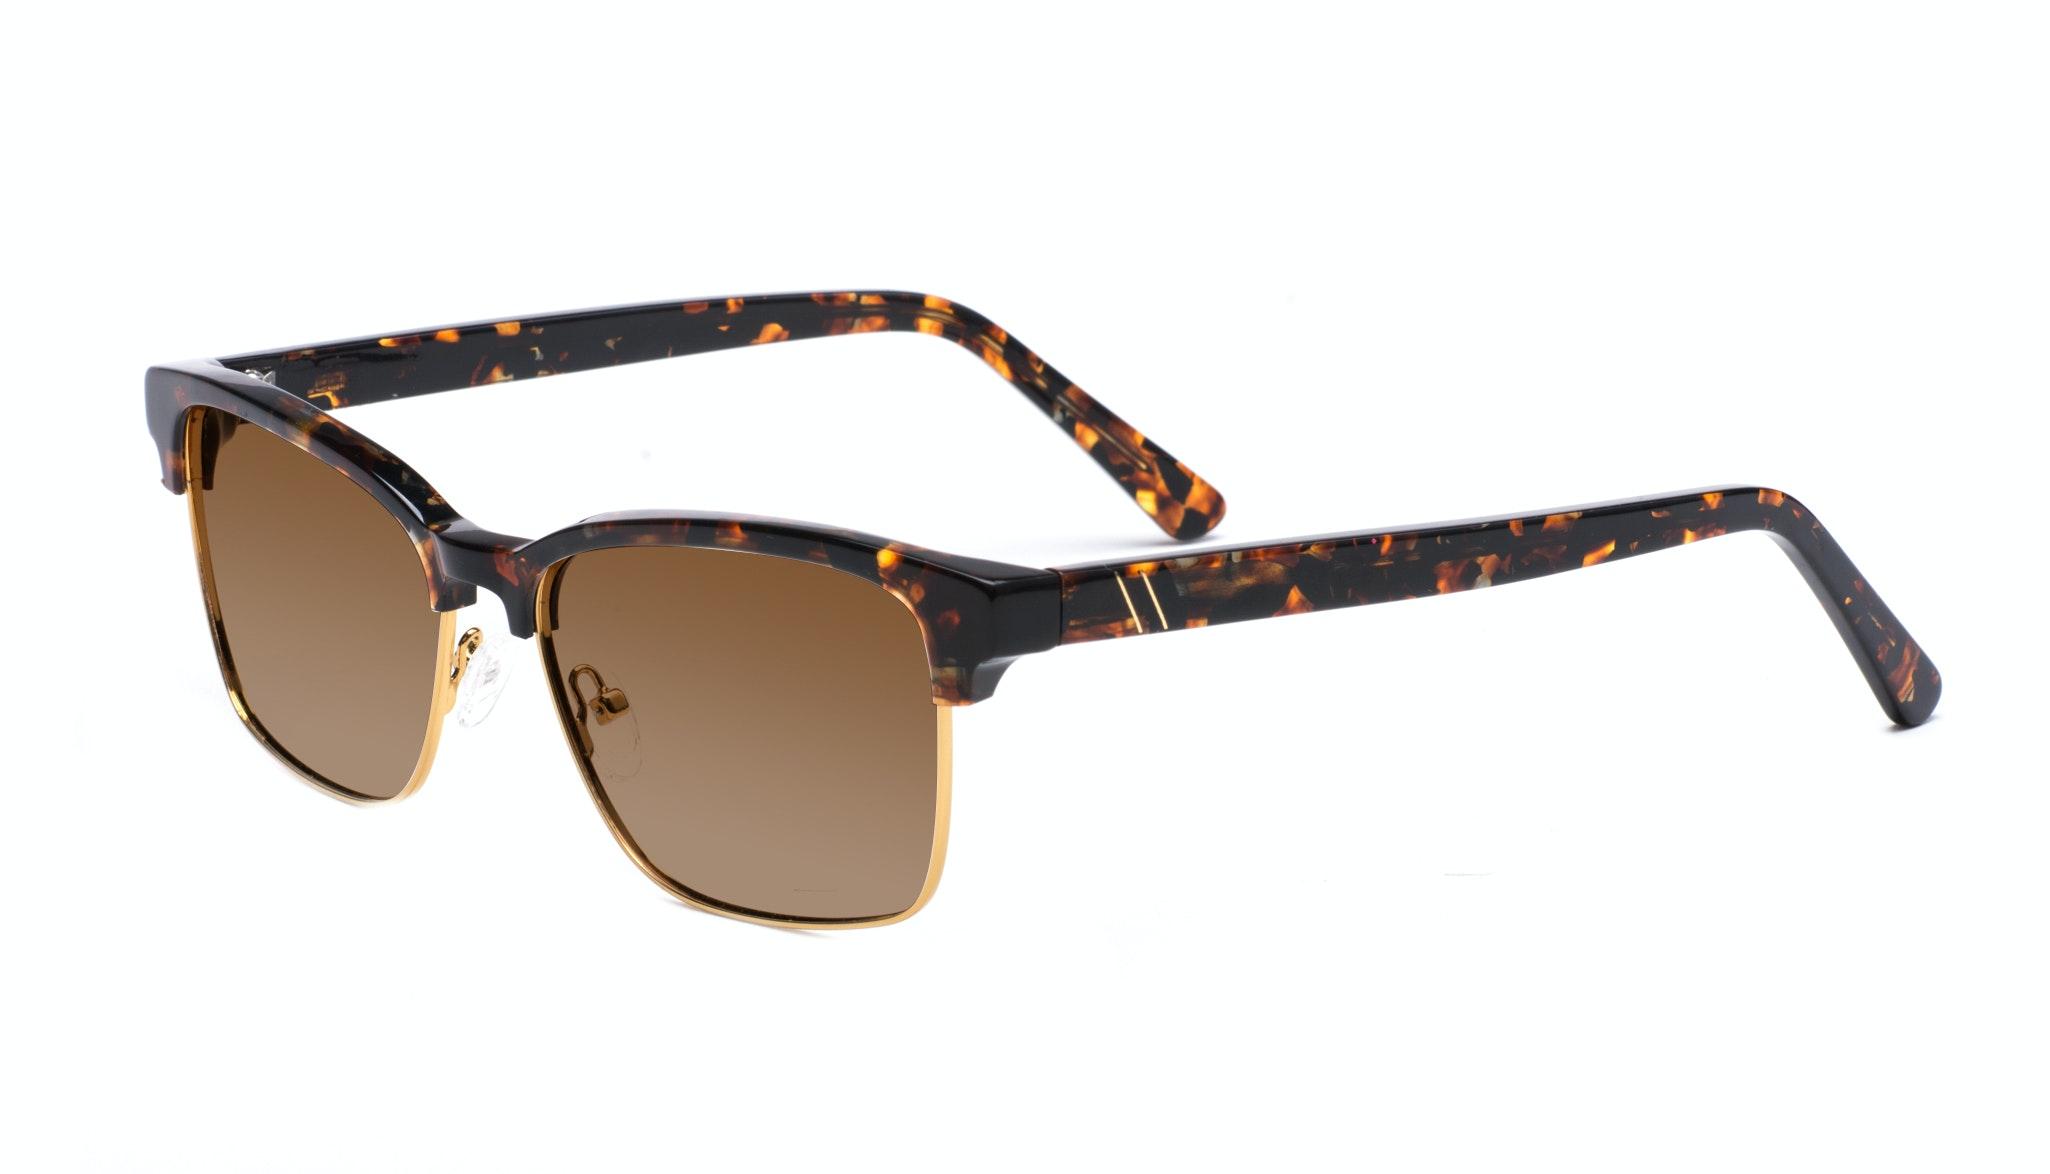 Affordable Fashion Glasses Rectangle Square Sunglasses Men Gallery Mahogany Tilt